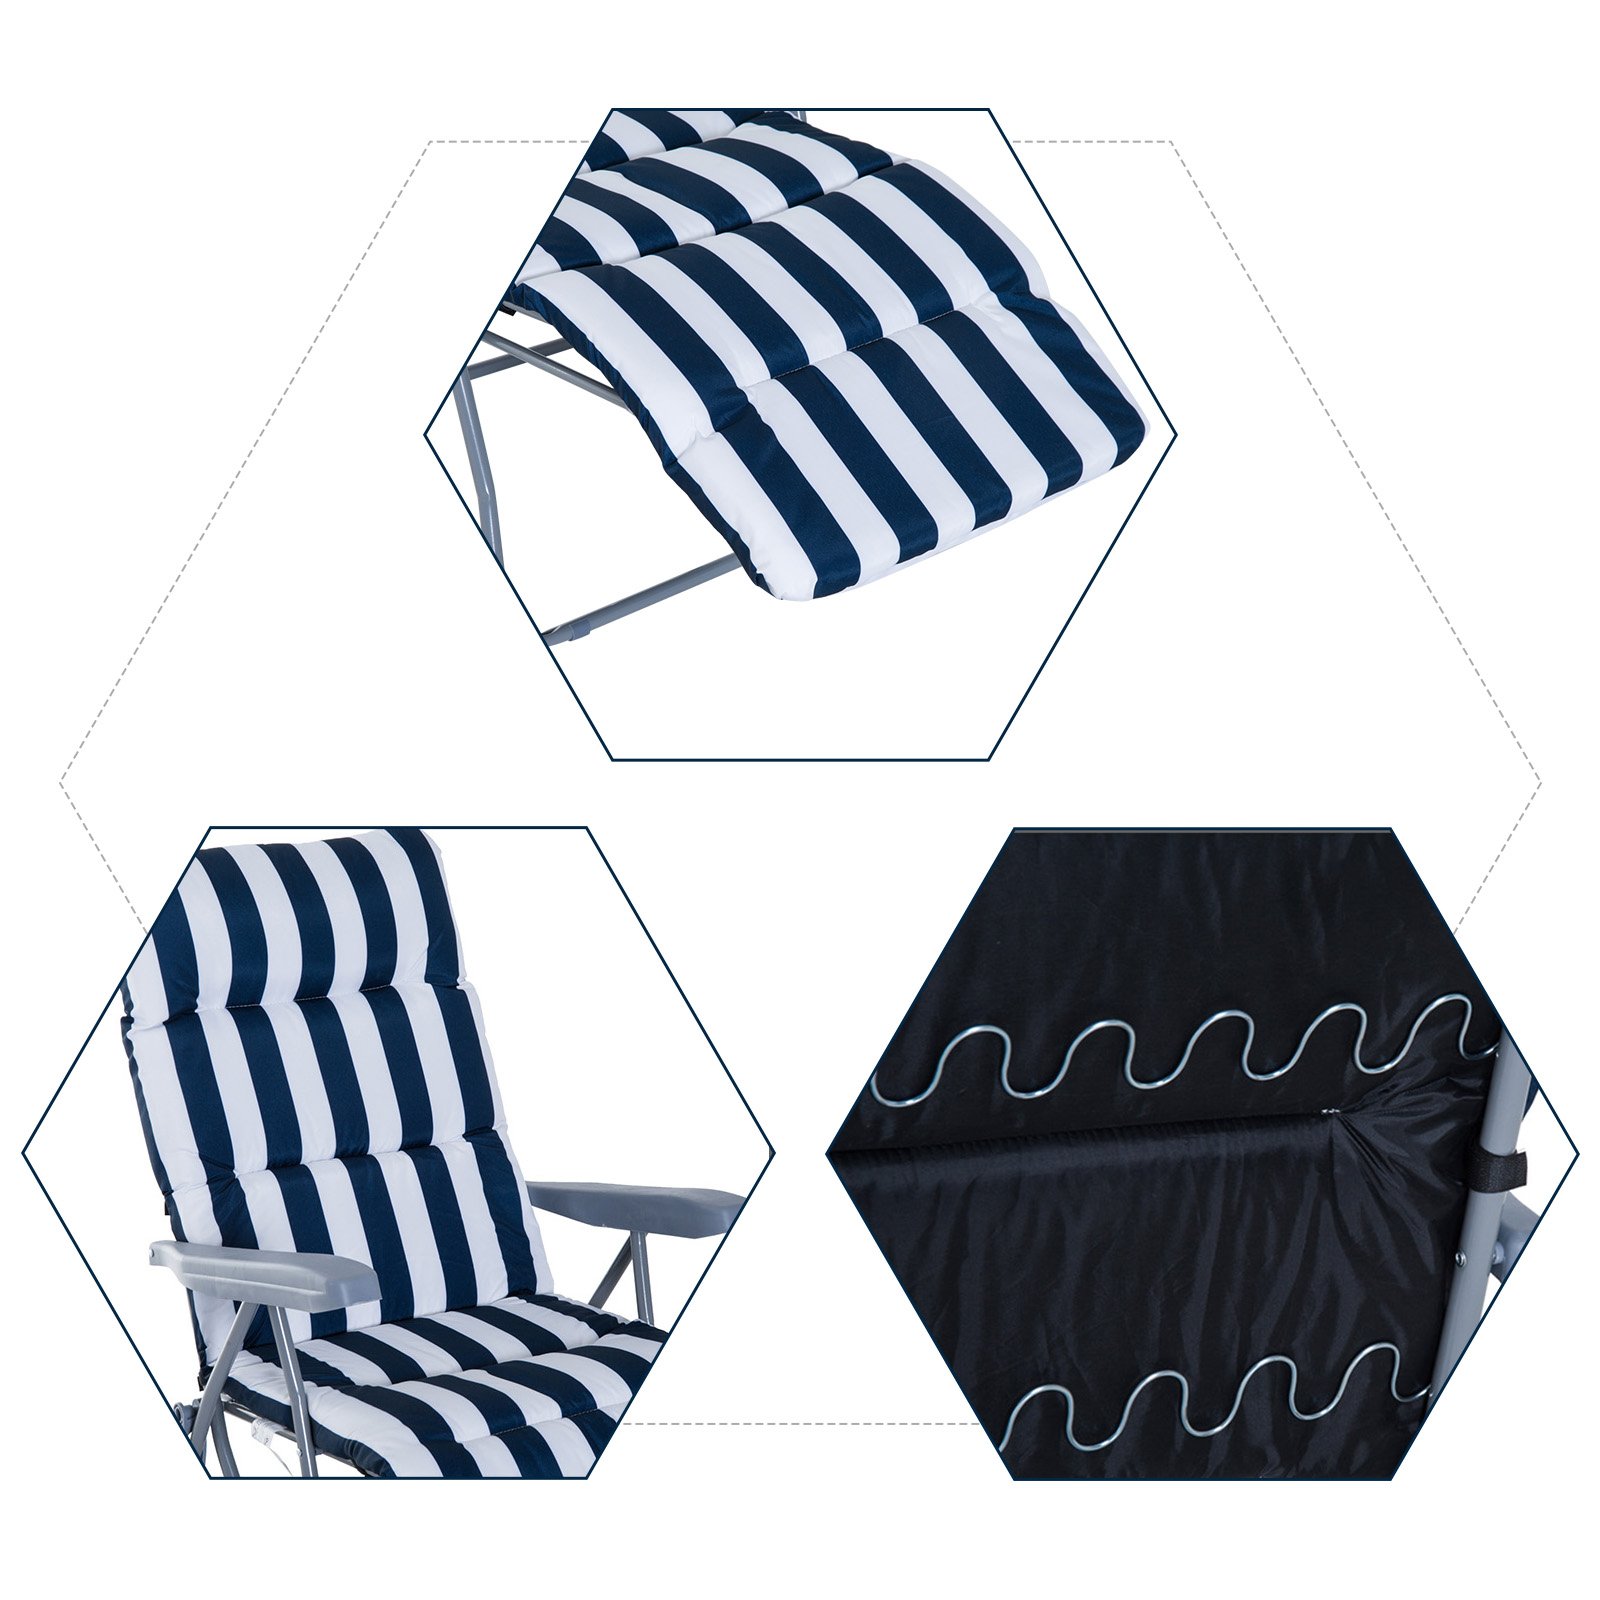 Tumbonas-2Pack-Acero-Plegable-Inclinable-Acolchado-Playa-Camping-Pack-2-Tumbonas miniatura 6